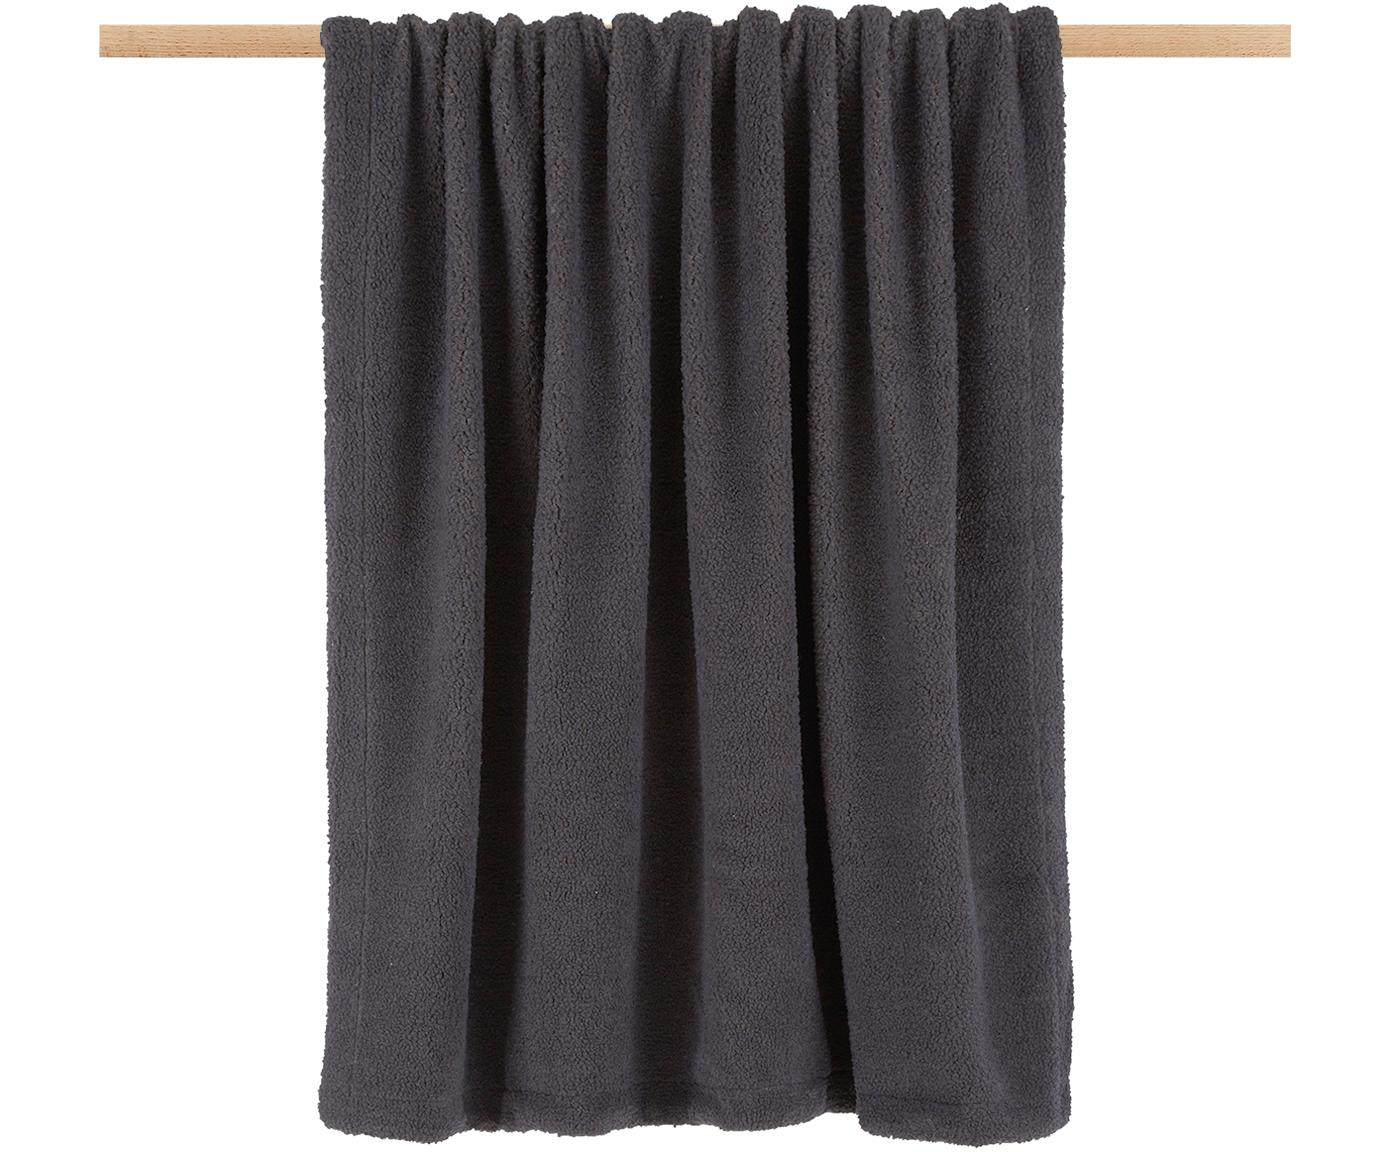 Manta de borreguillo Mille, Parte superior: 100%poliéster (borreguil, Parte trasera: 100%poliéster, Gris oscuro, An 150 x L 200 cm